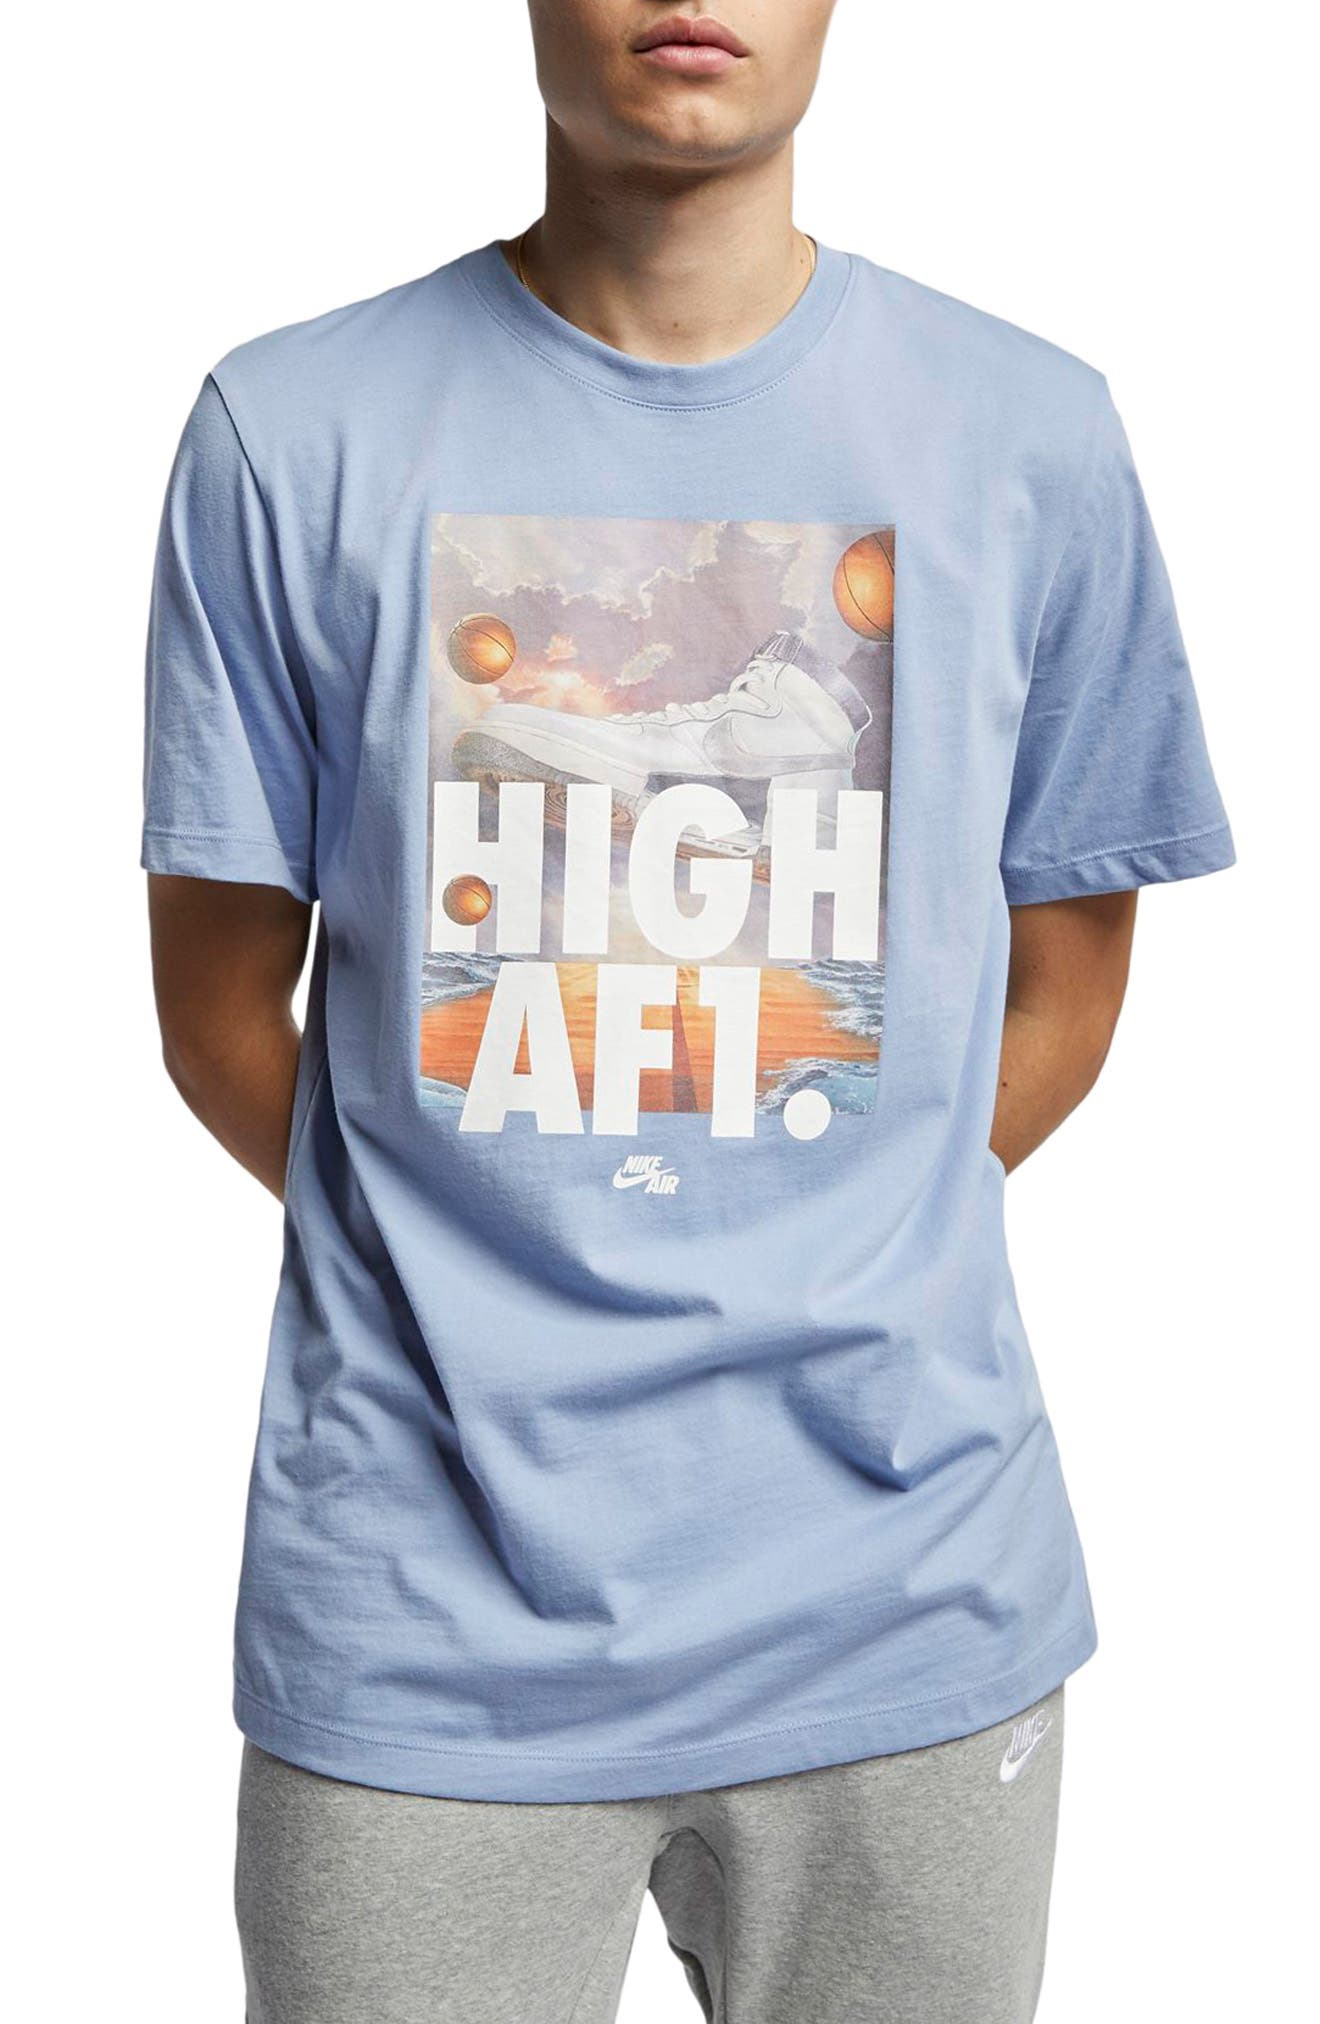 ca6461b526ef Nike Air Force 1 T-Shirt Blue